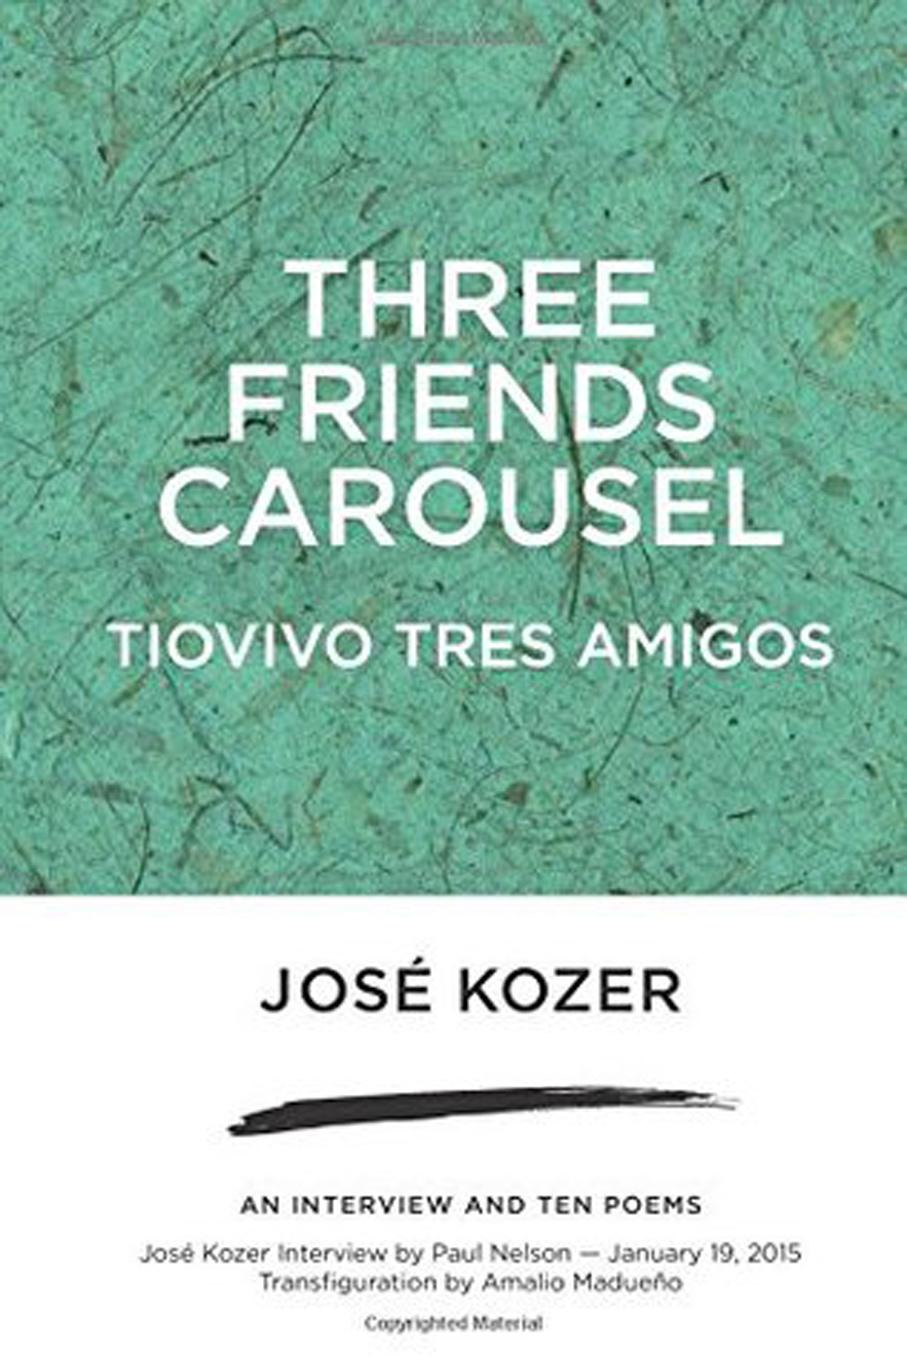 Three Friends Carousel: Tiovivo Tres Amigos